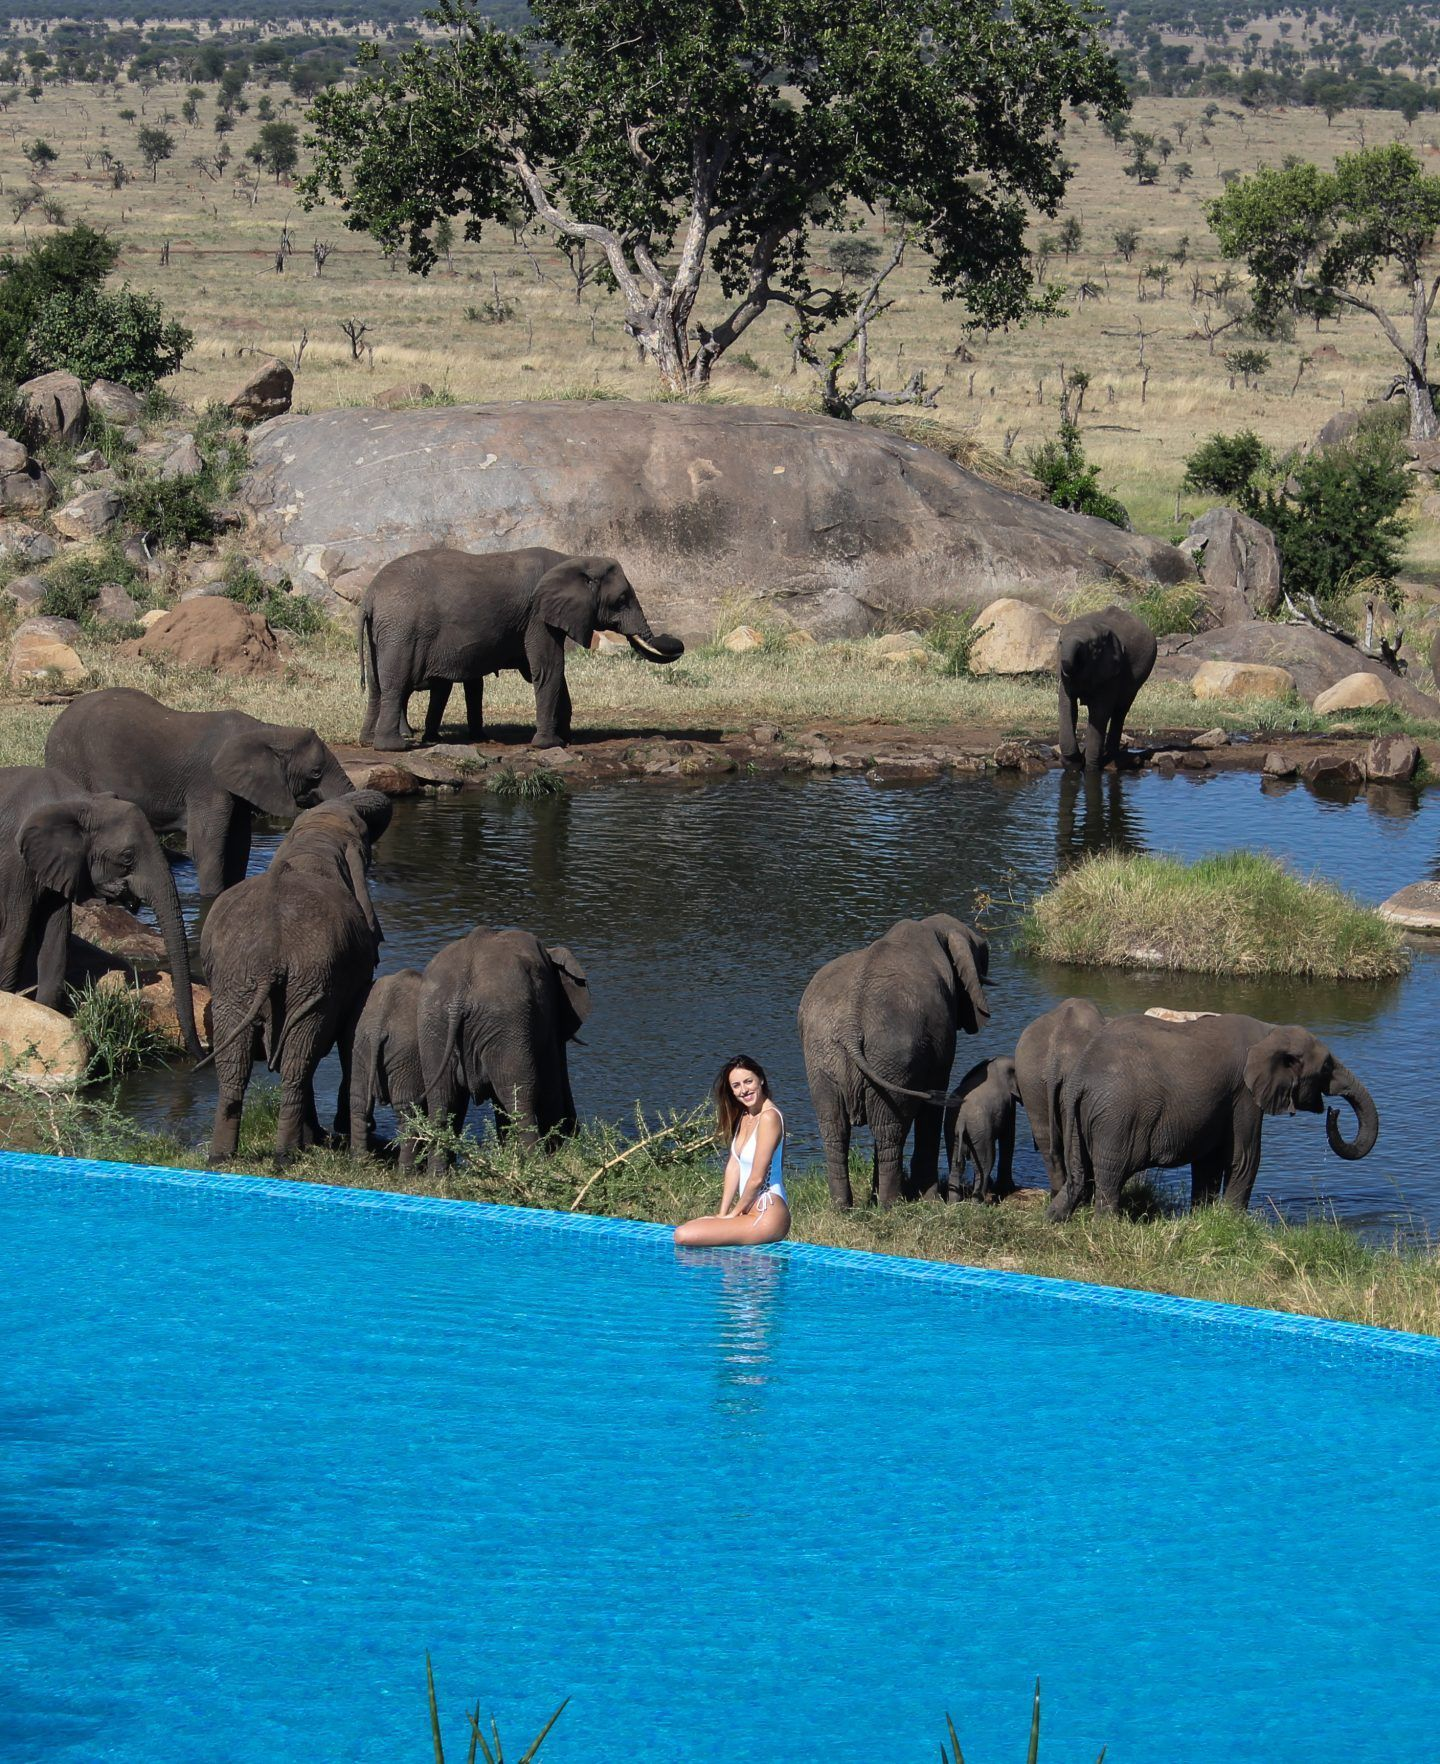 Serengeti Tanzania Safari Lodge Four Seasons Safari Lodge Experience Thrilling Serengeti Game Drives And The African Vacation Tanzania Travel Tanzania Safari